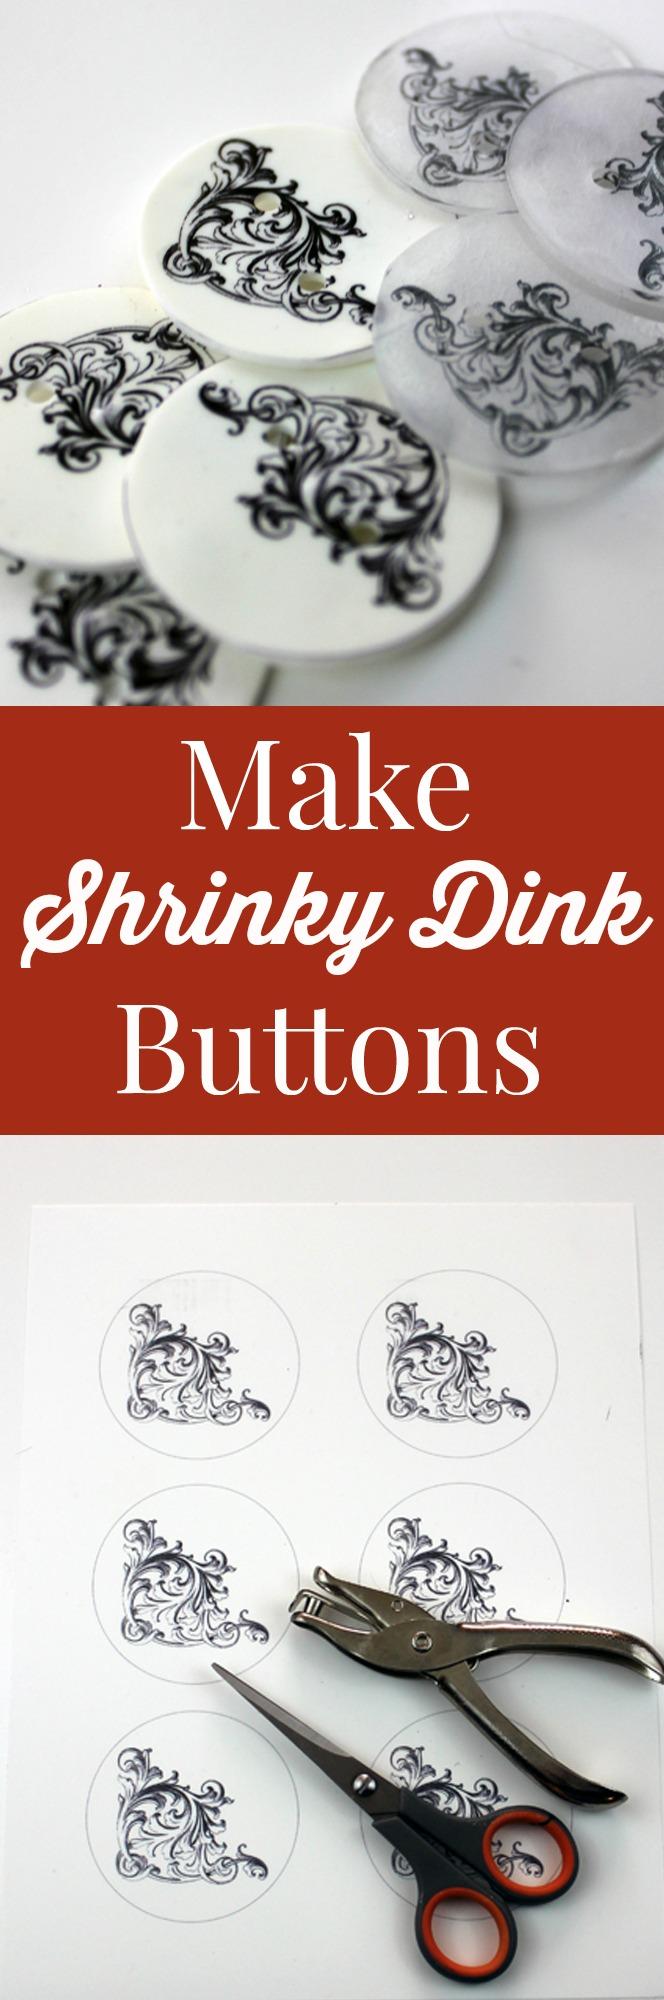 Make Shrinky Dink Buttons